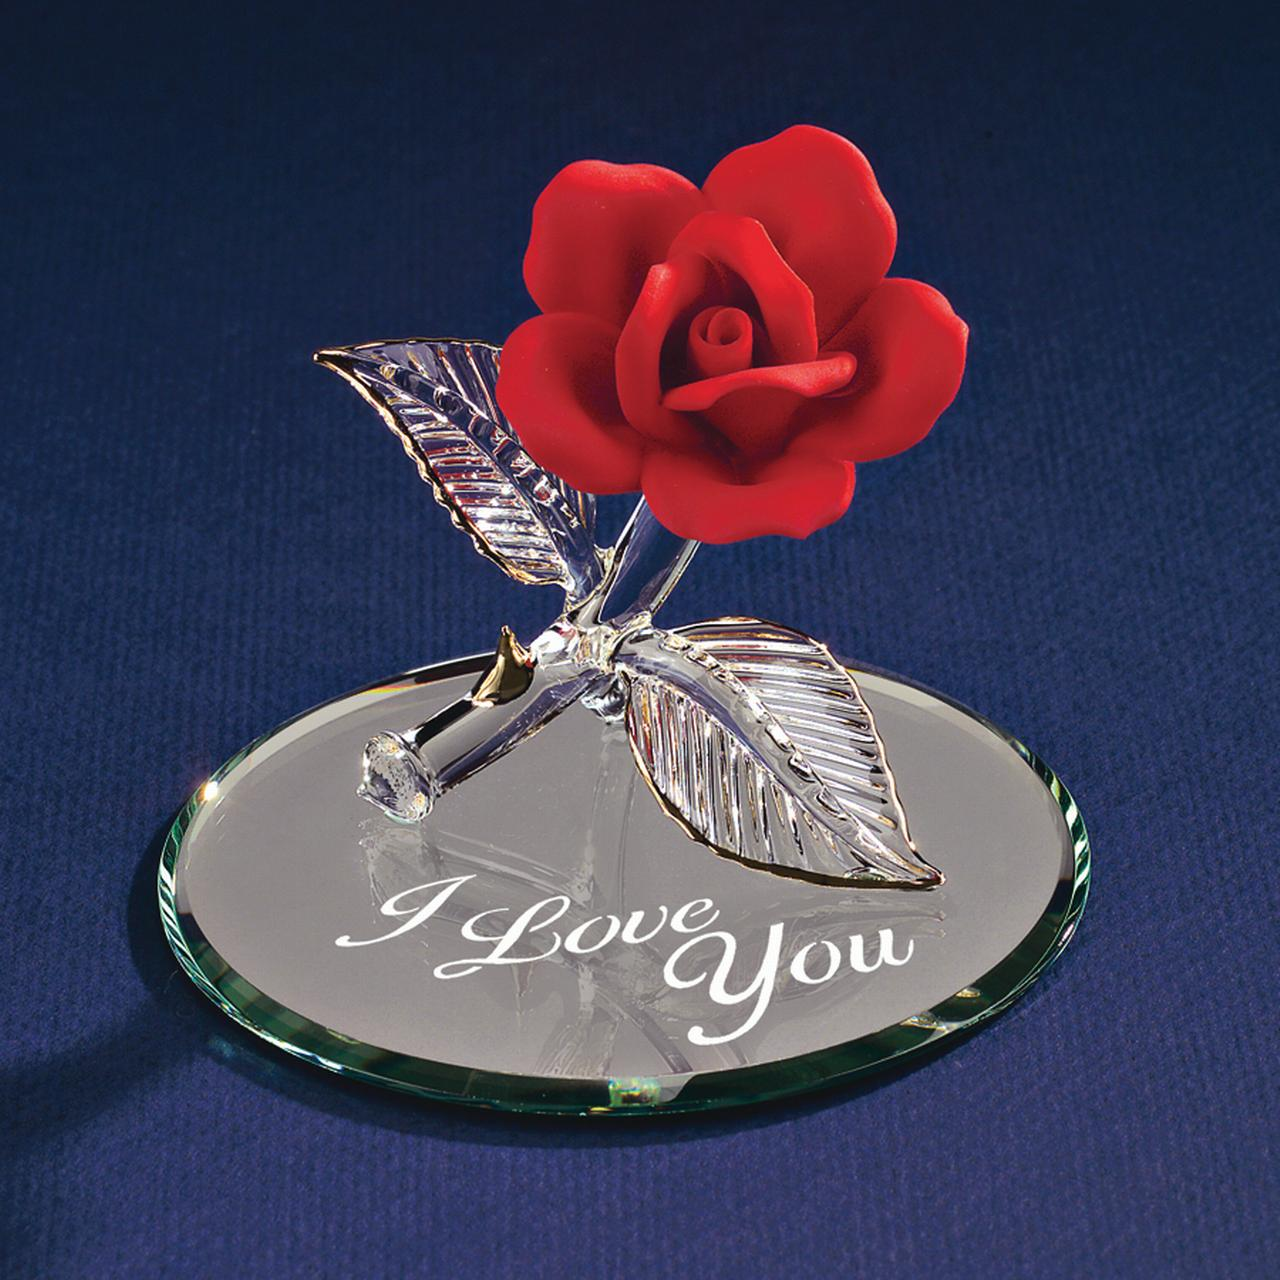 Red Rose I Love You Glass Figurine Floral Garden Nautical Keepsake Glas Baron For Women